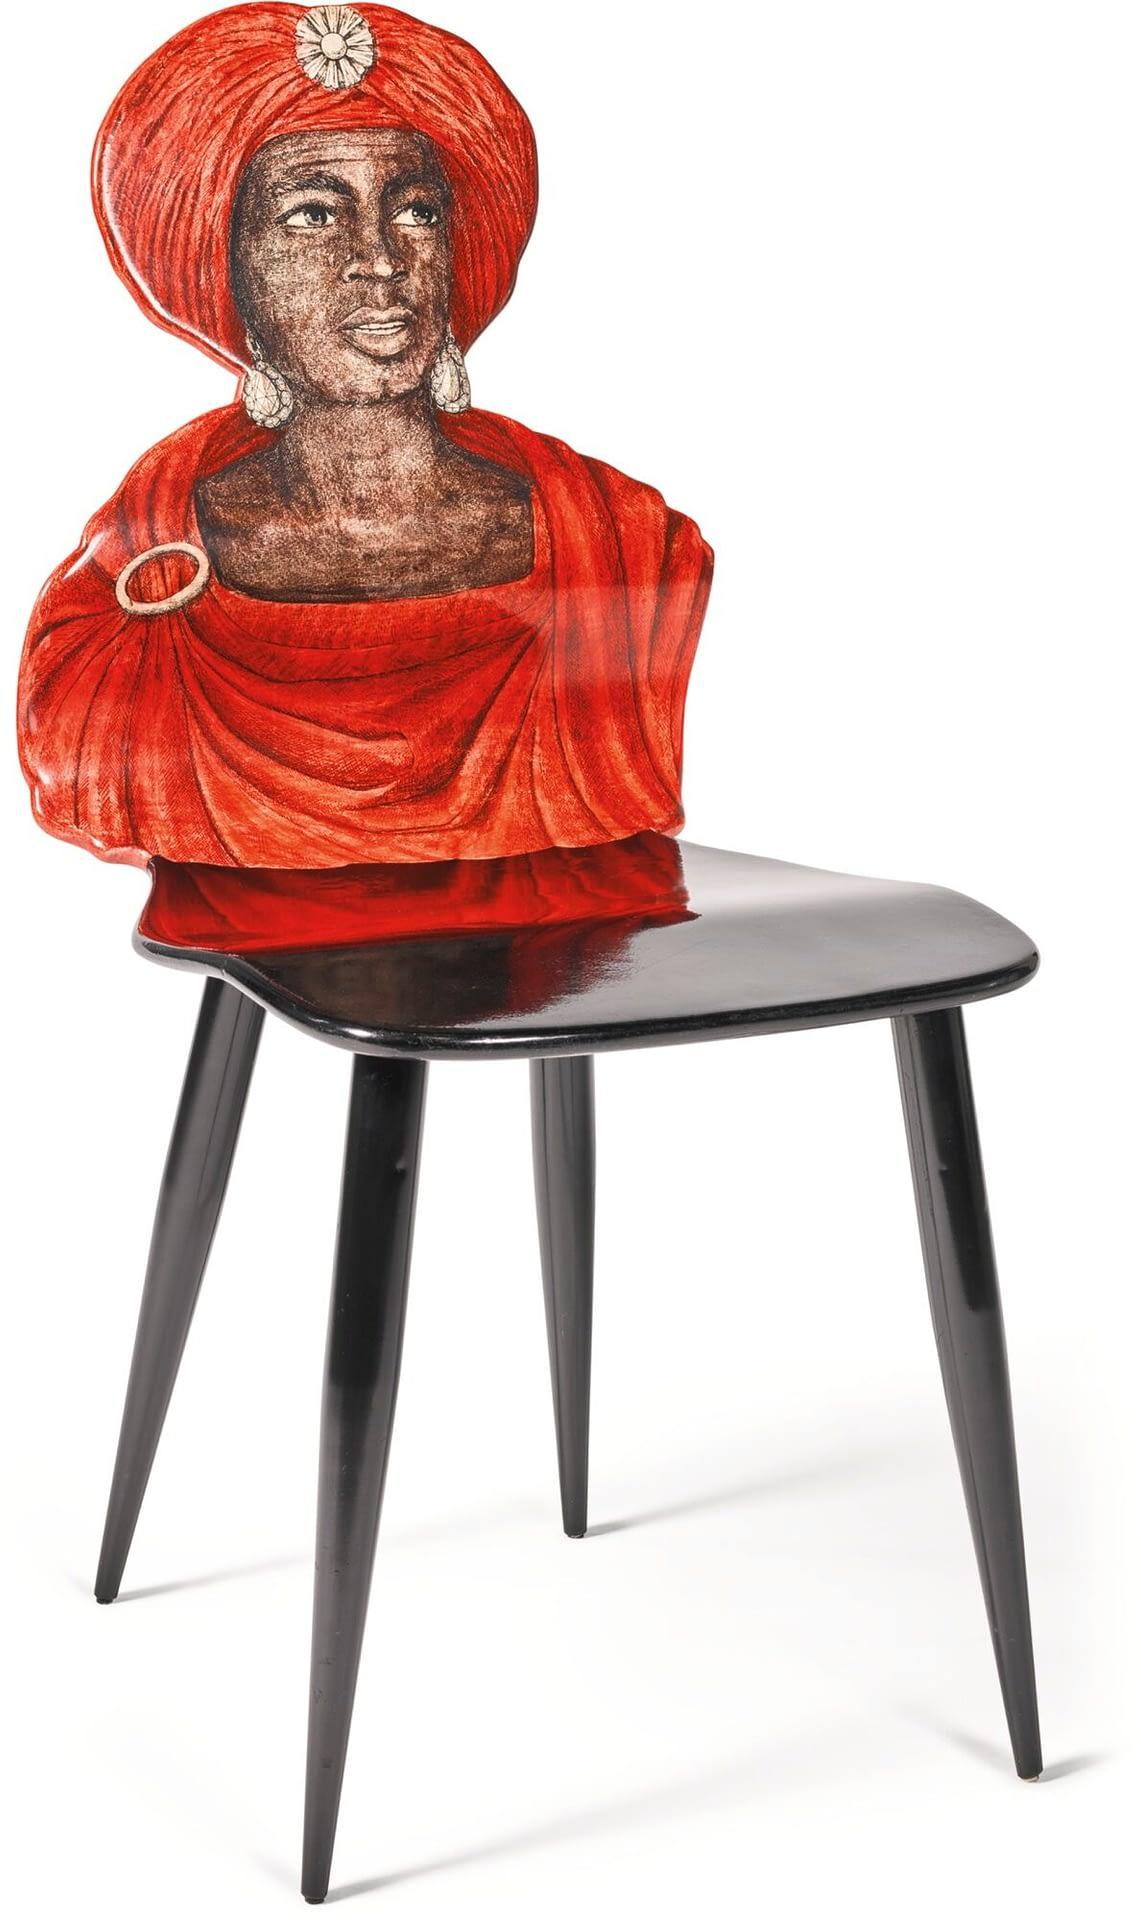 Fornasetti furniture fornesetti moro chair 1950